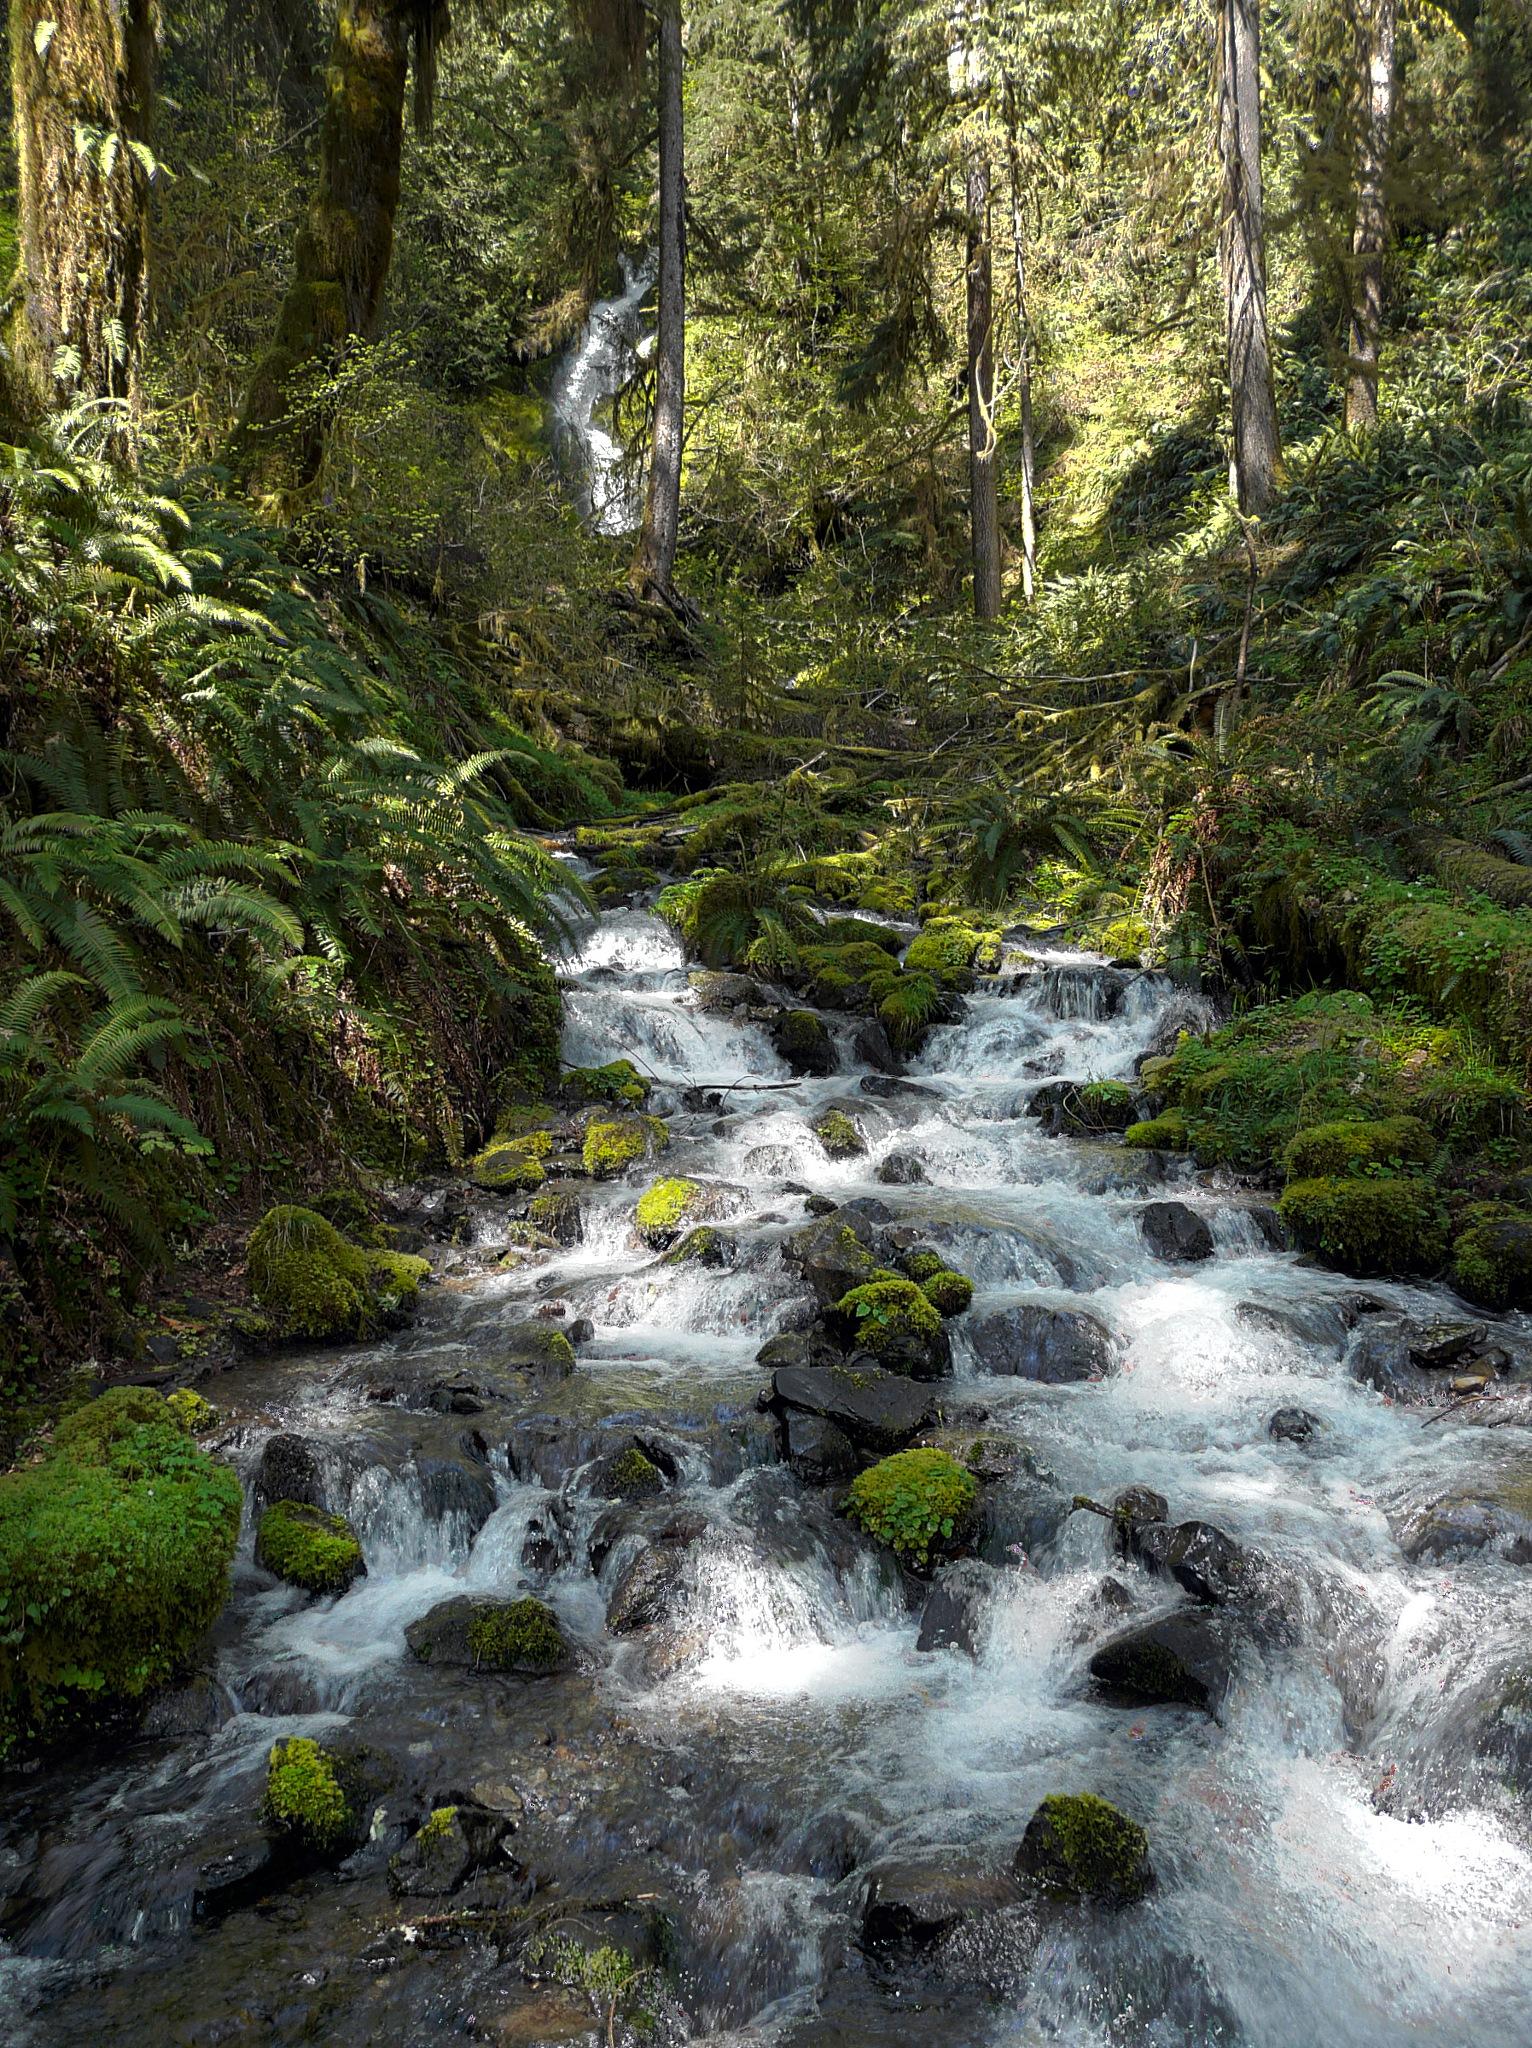 Hoh Rain Forest by Bret Little